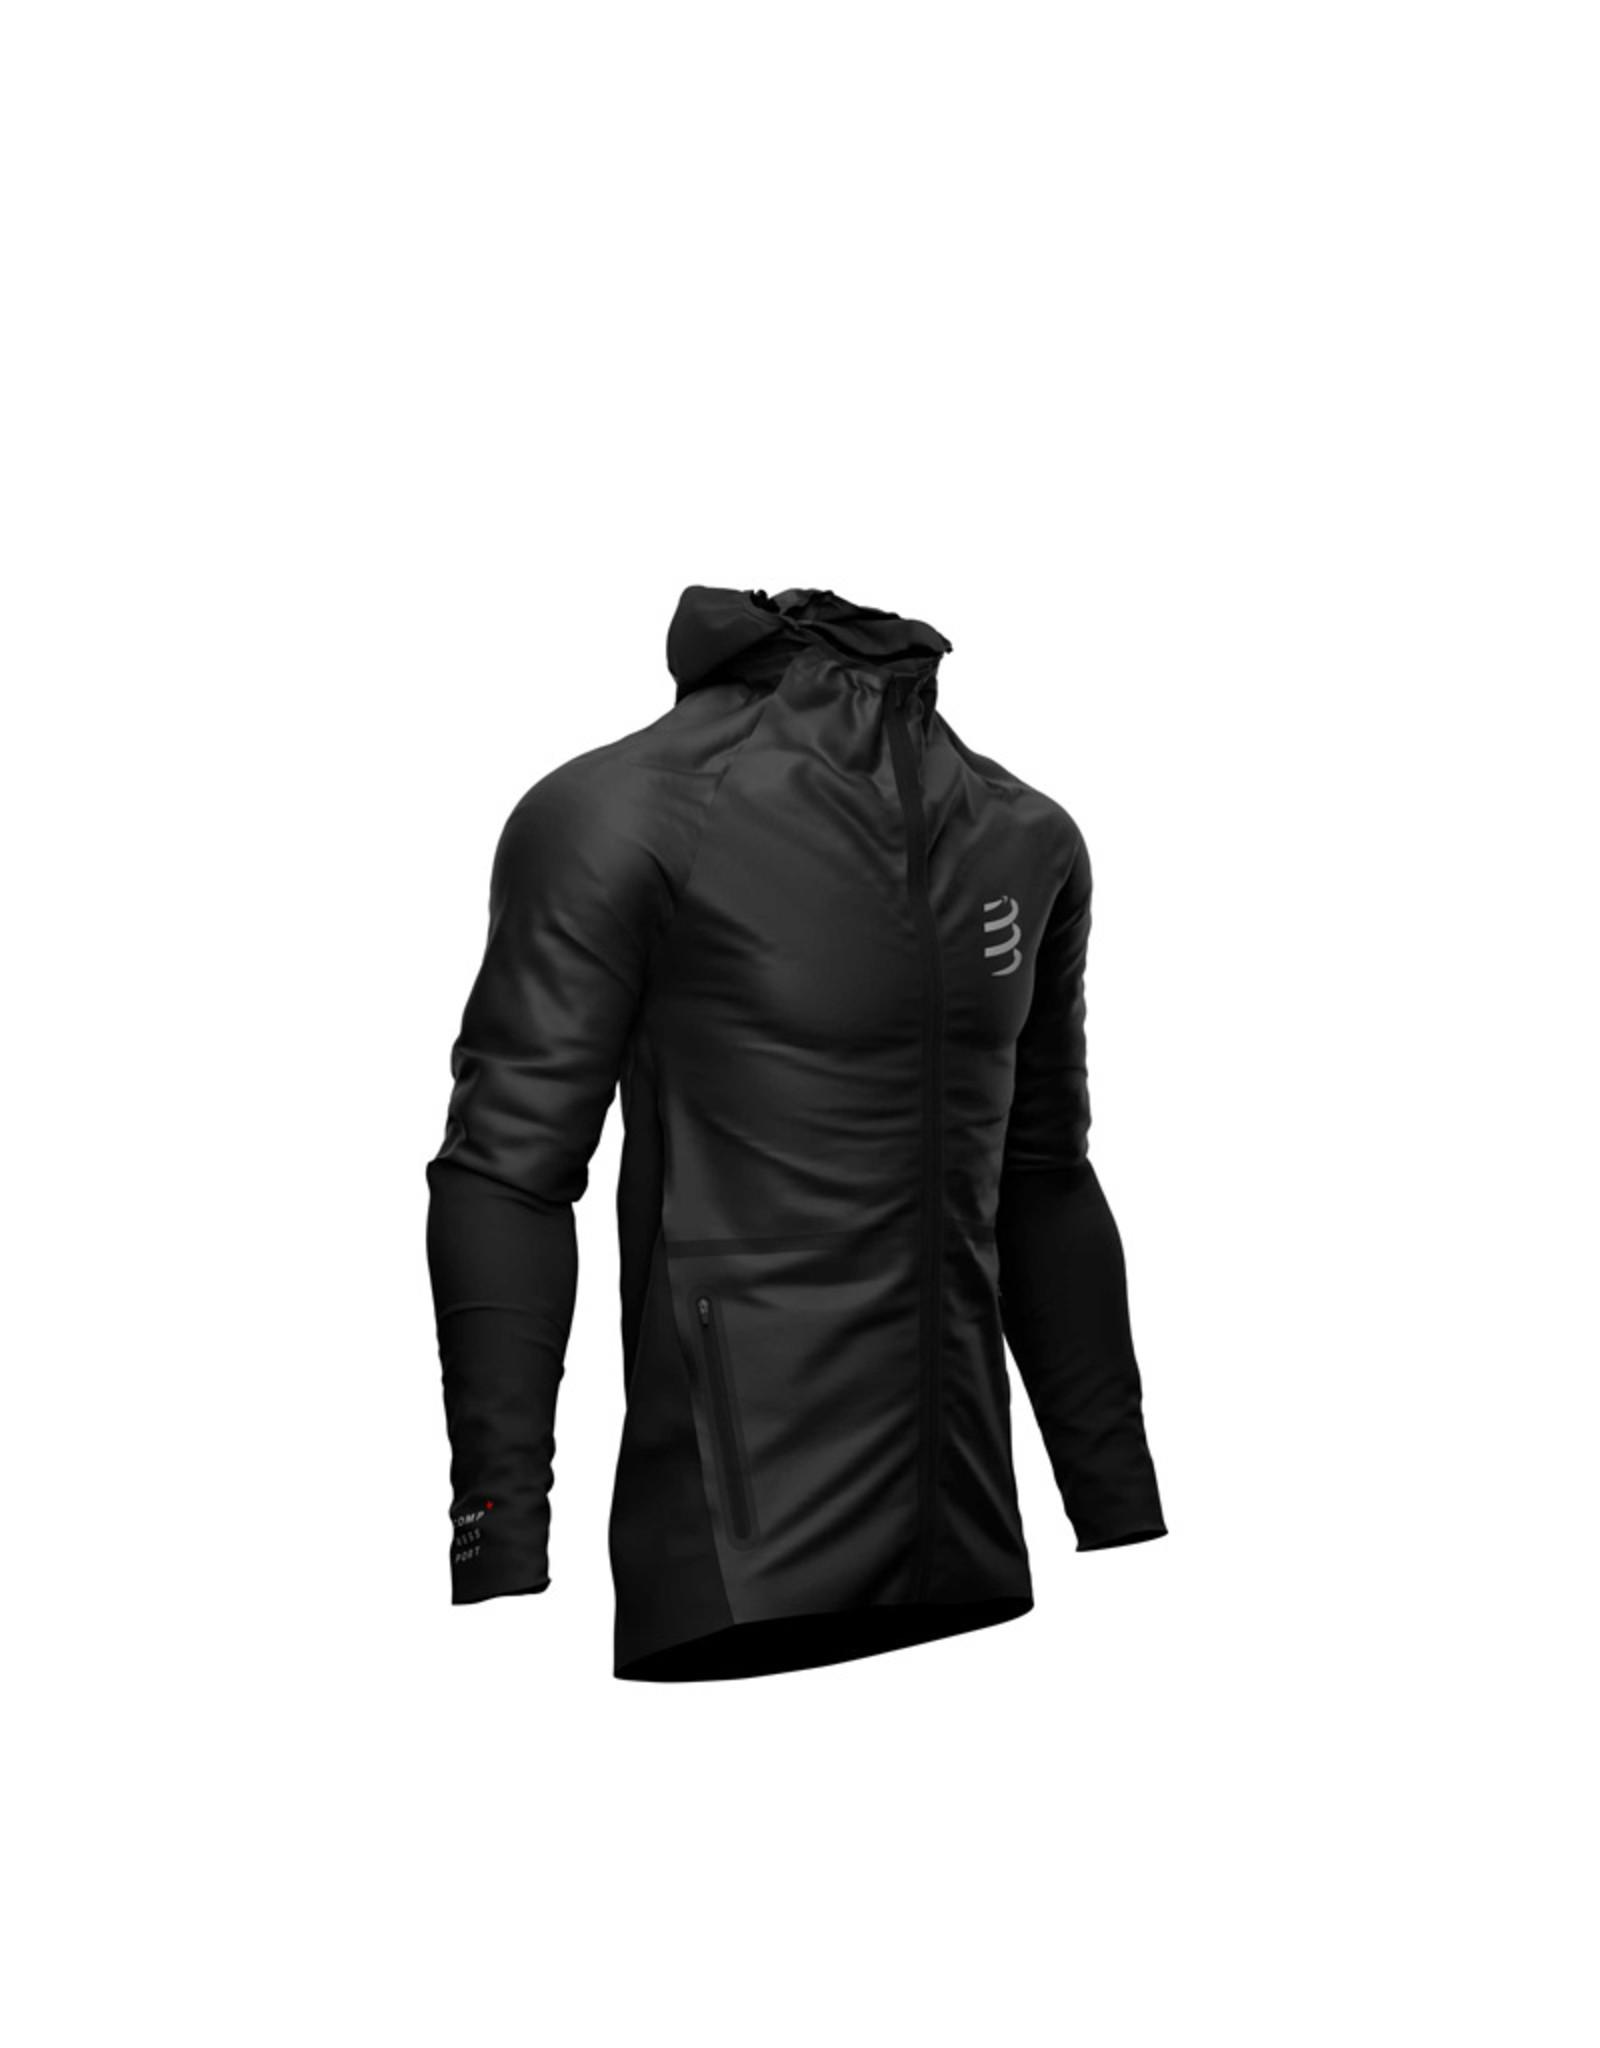 Compressport Hurricane Waterproof 25/75 Jacket Veste Impermeable - Noir